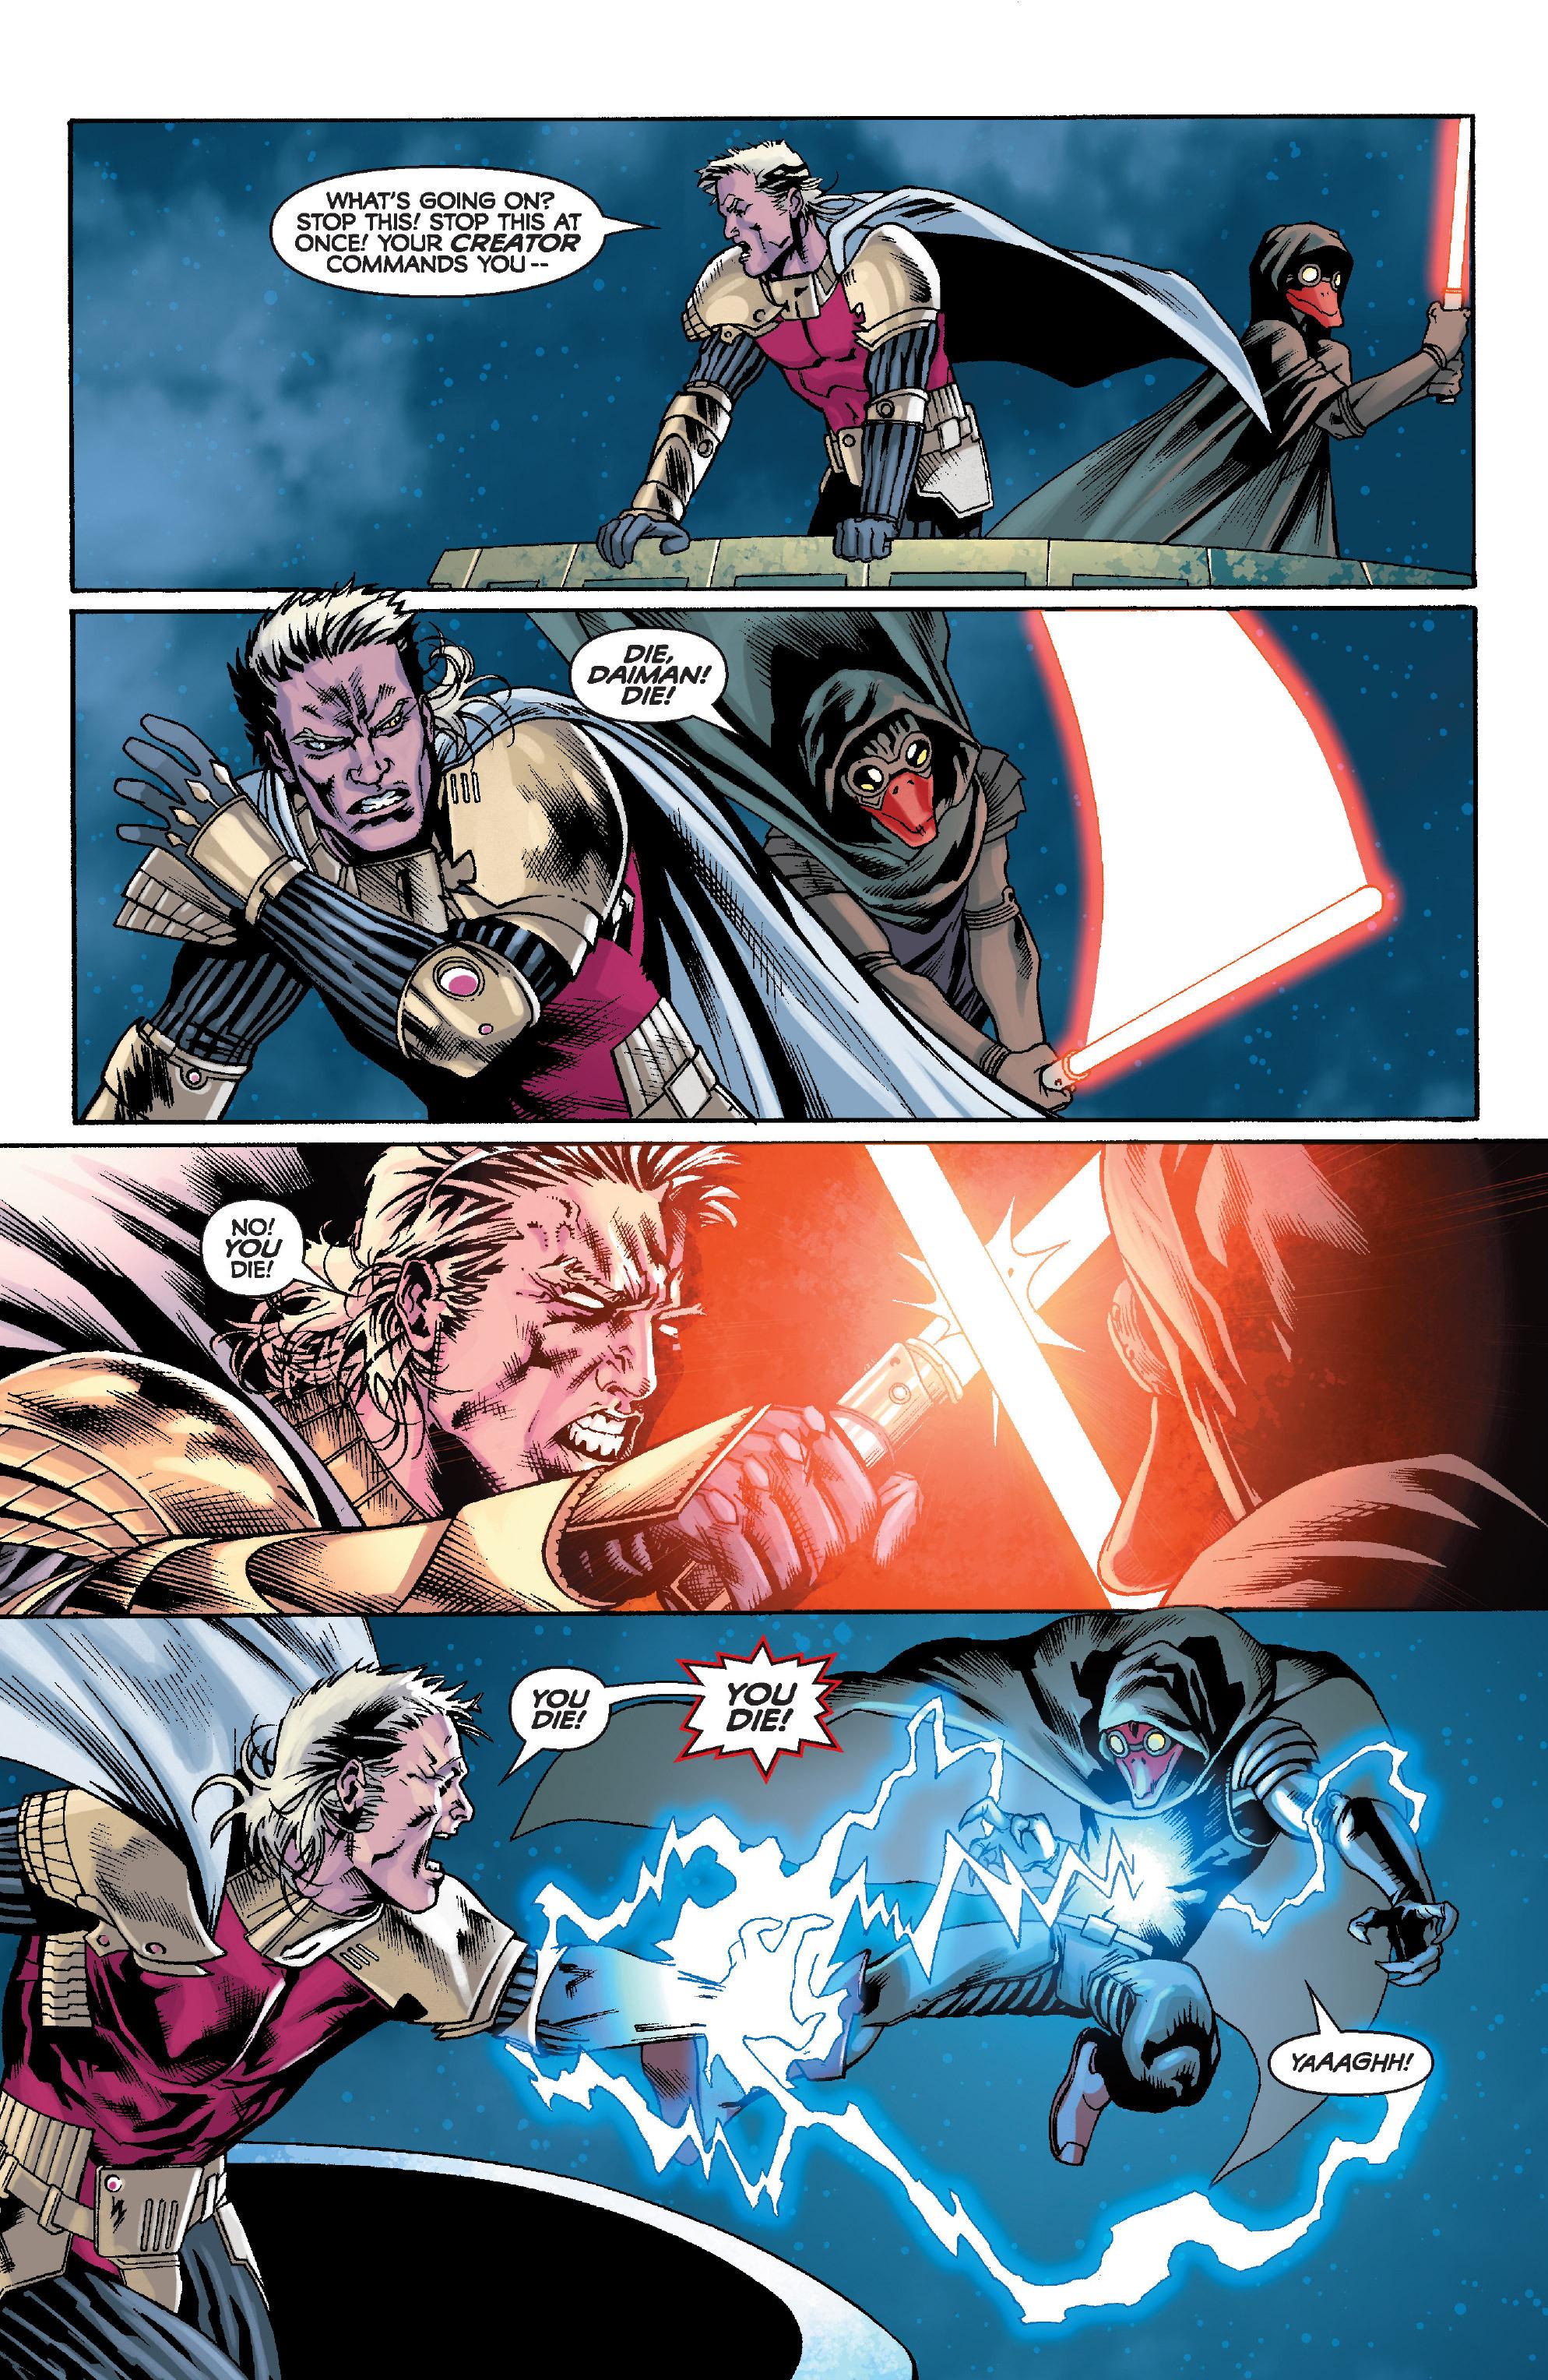 Read online Star Wars: Knight Errant - Escape comic -  Issue #4 - 14